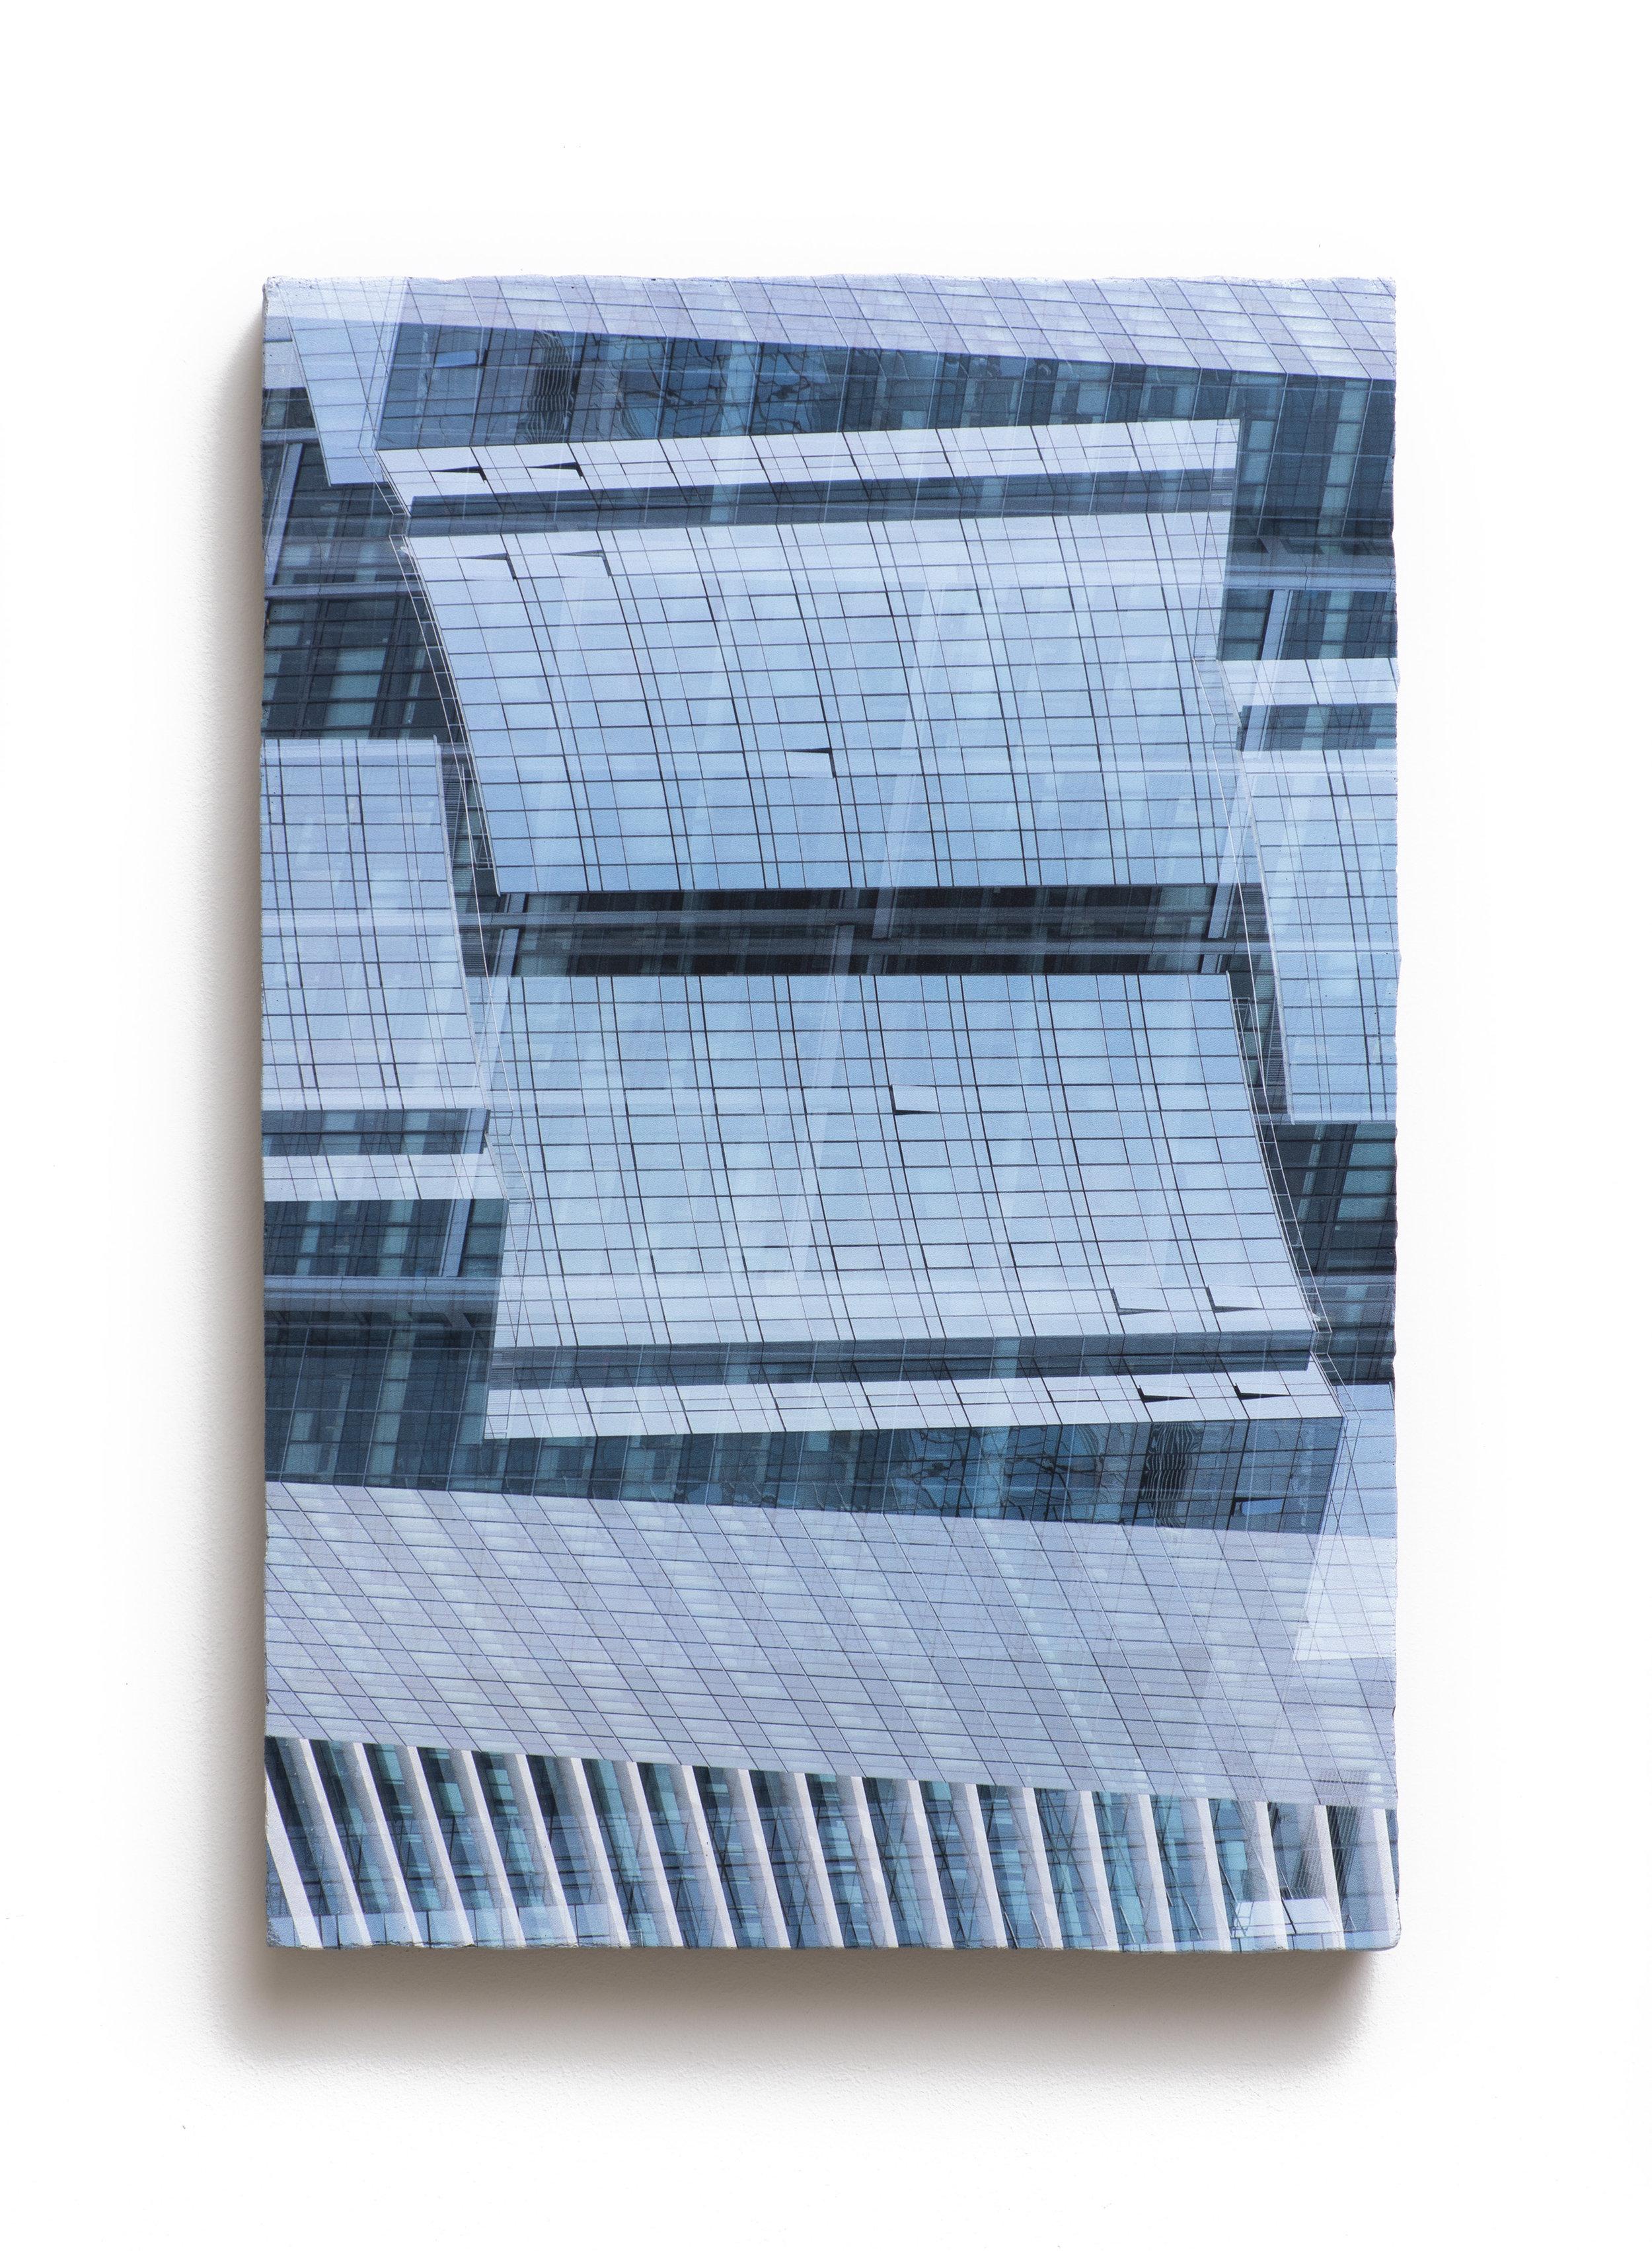 Counterform Planes, 2017 UV ink on concrete 18 1/2 × 12 1/2 × 1 1/2 in Unique